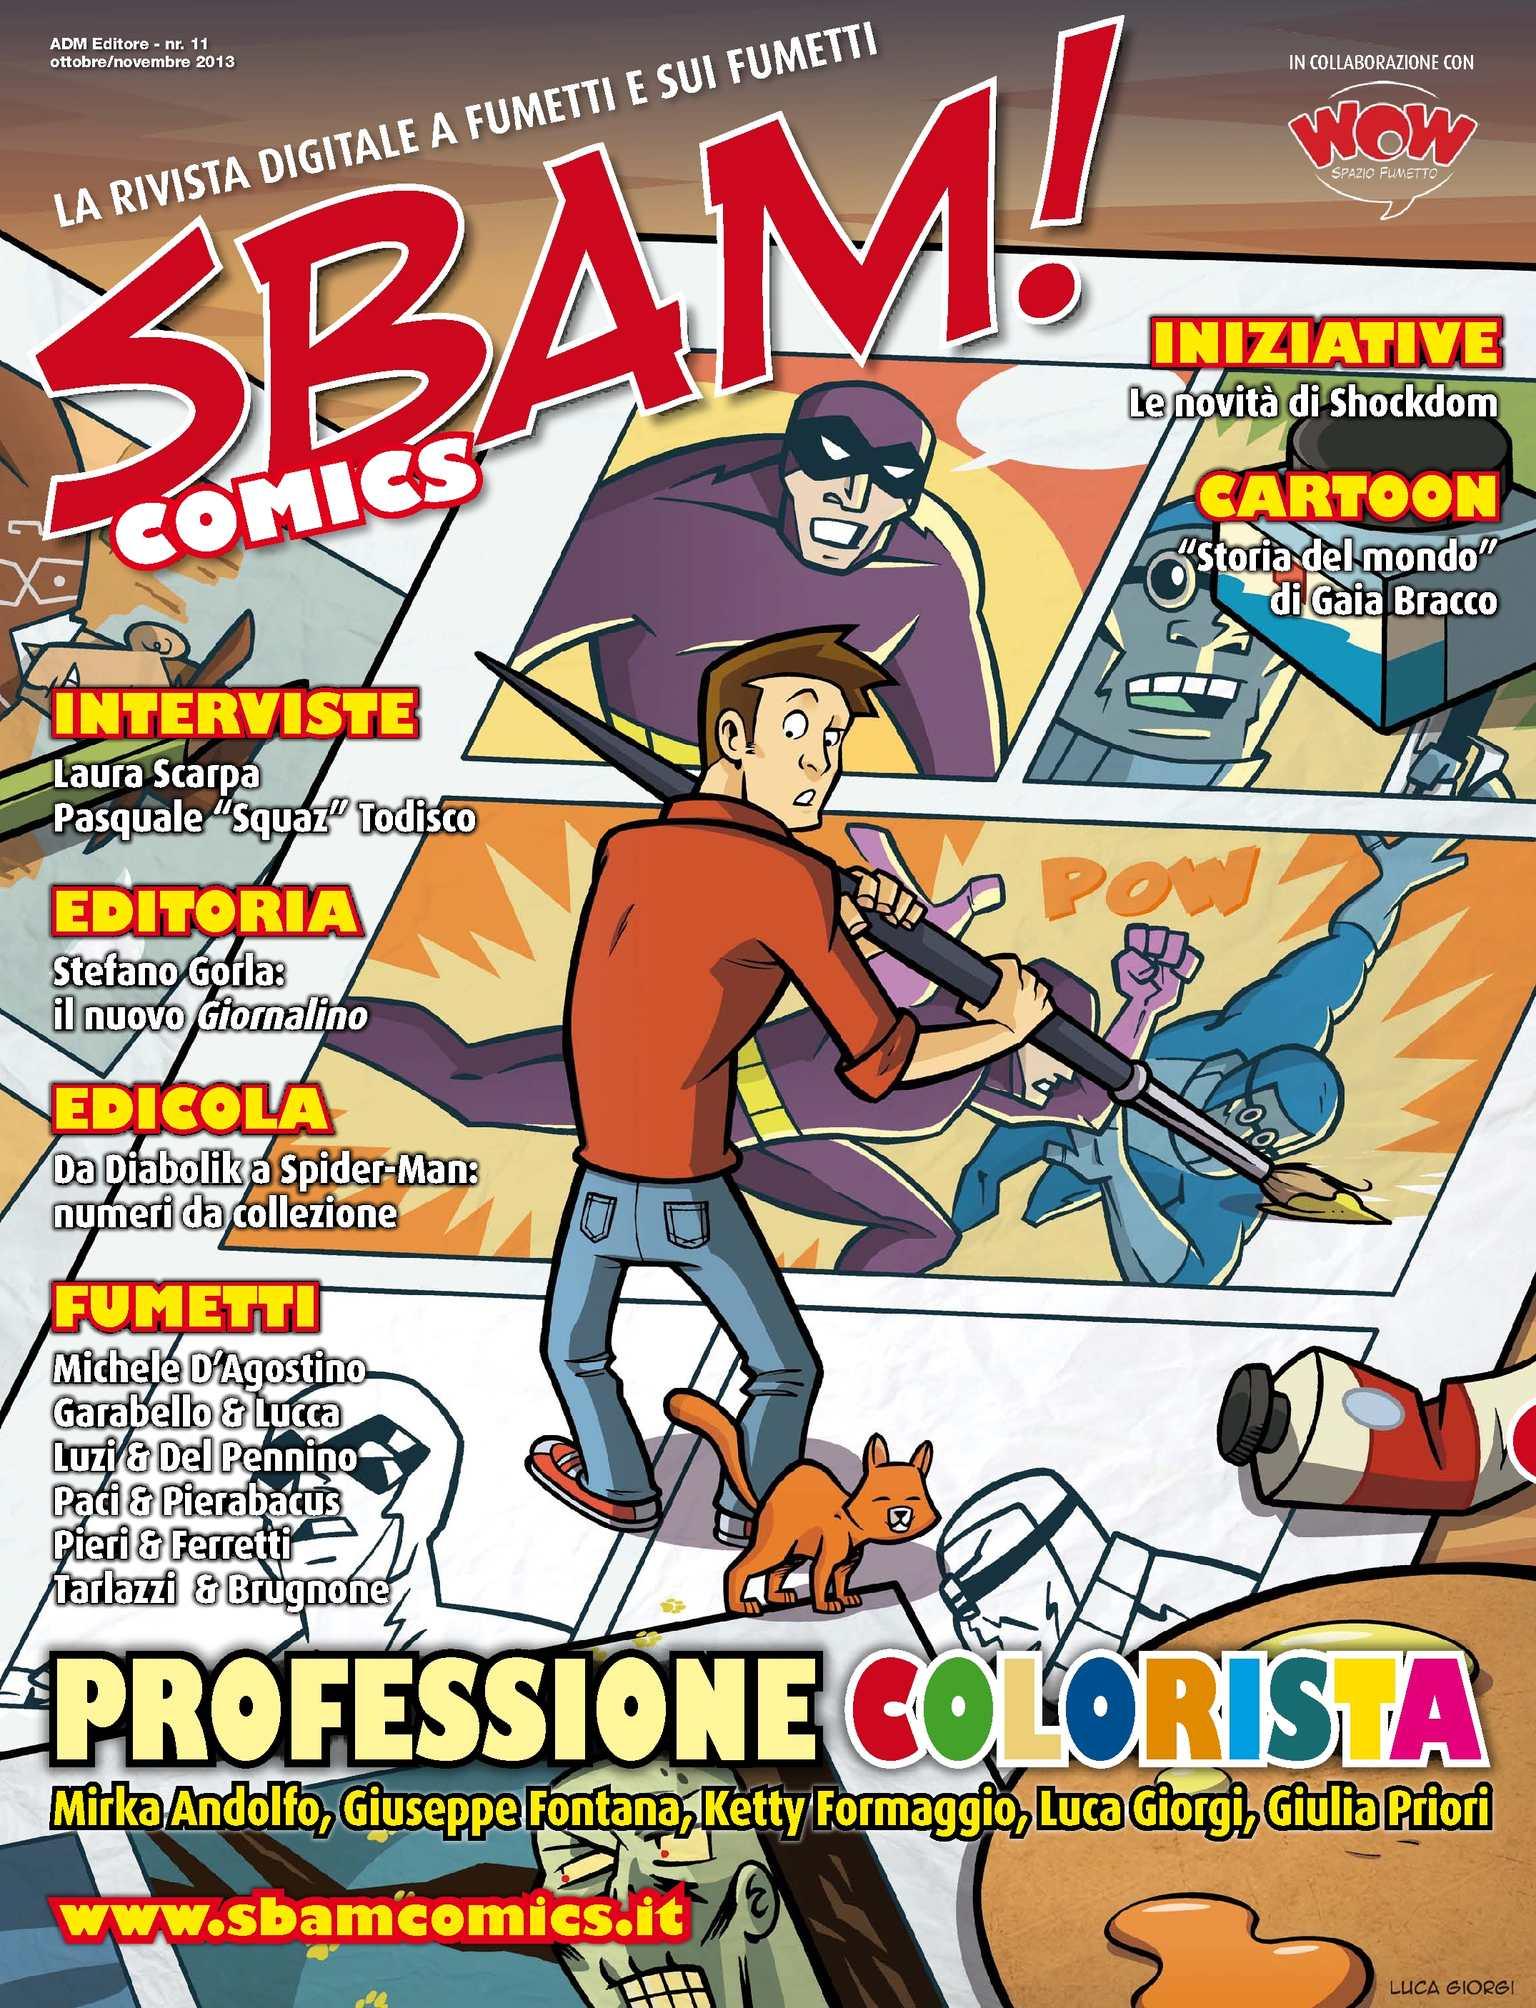 Calaméo - Sbam! Comics nr. 11 f41362ca09c7